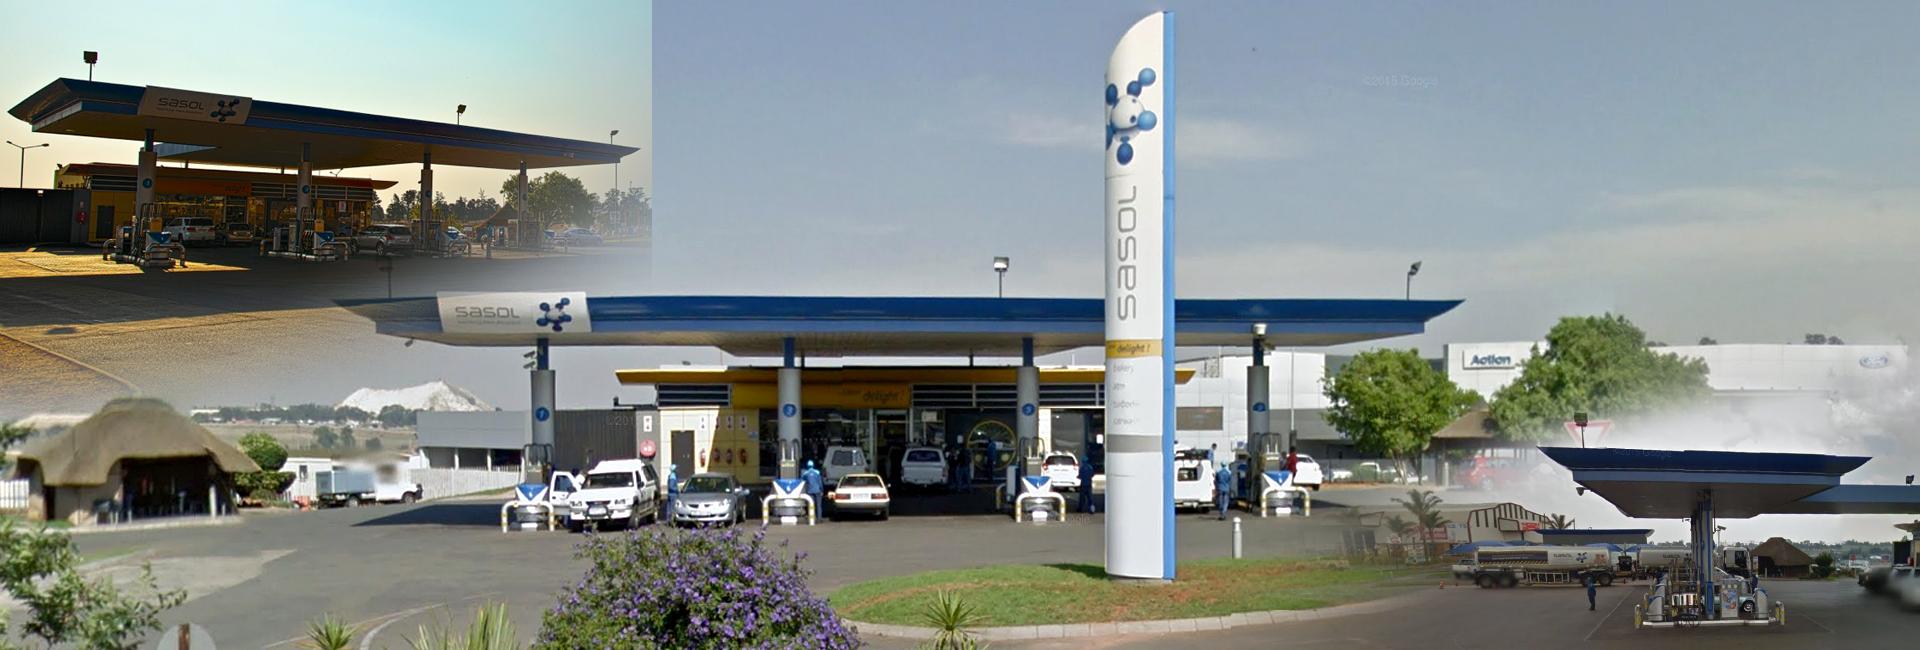 Sasol Petroleum Station